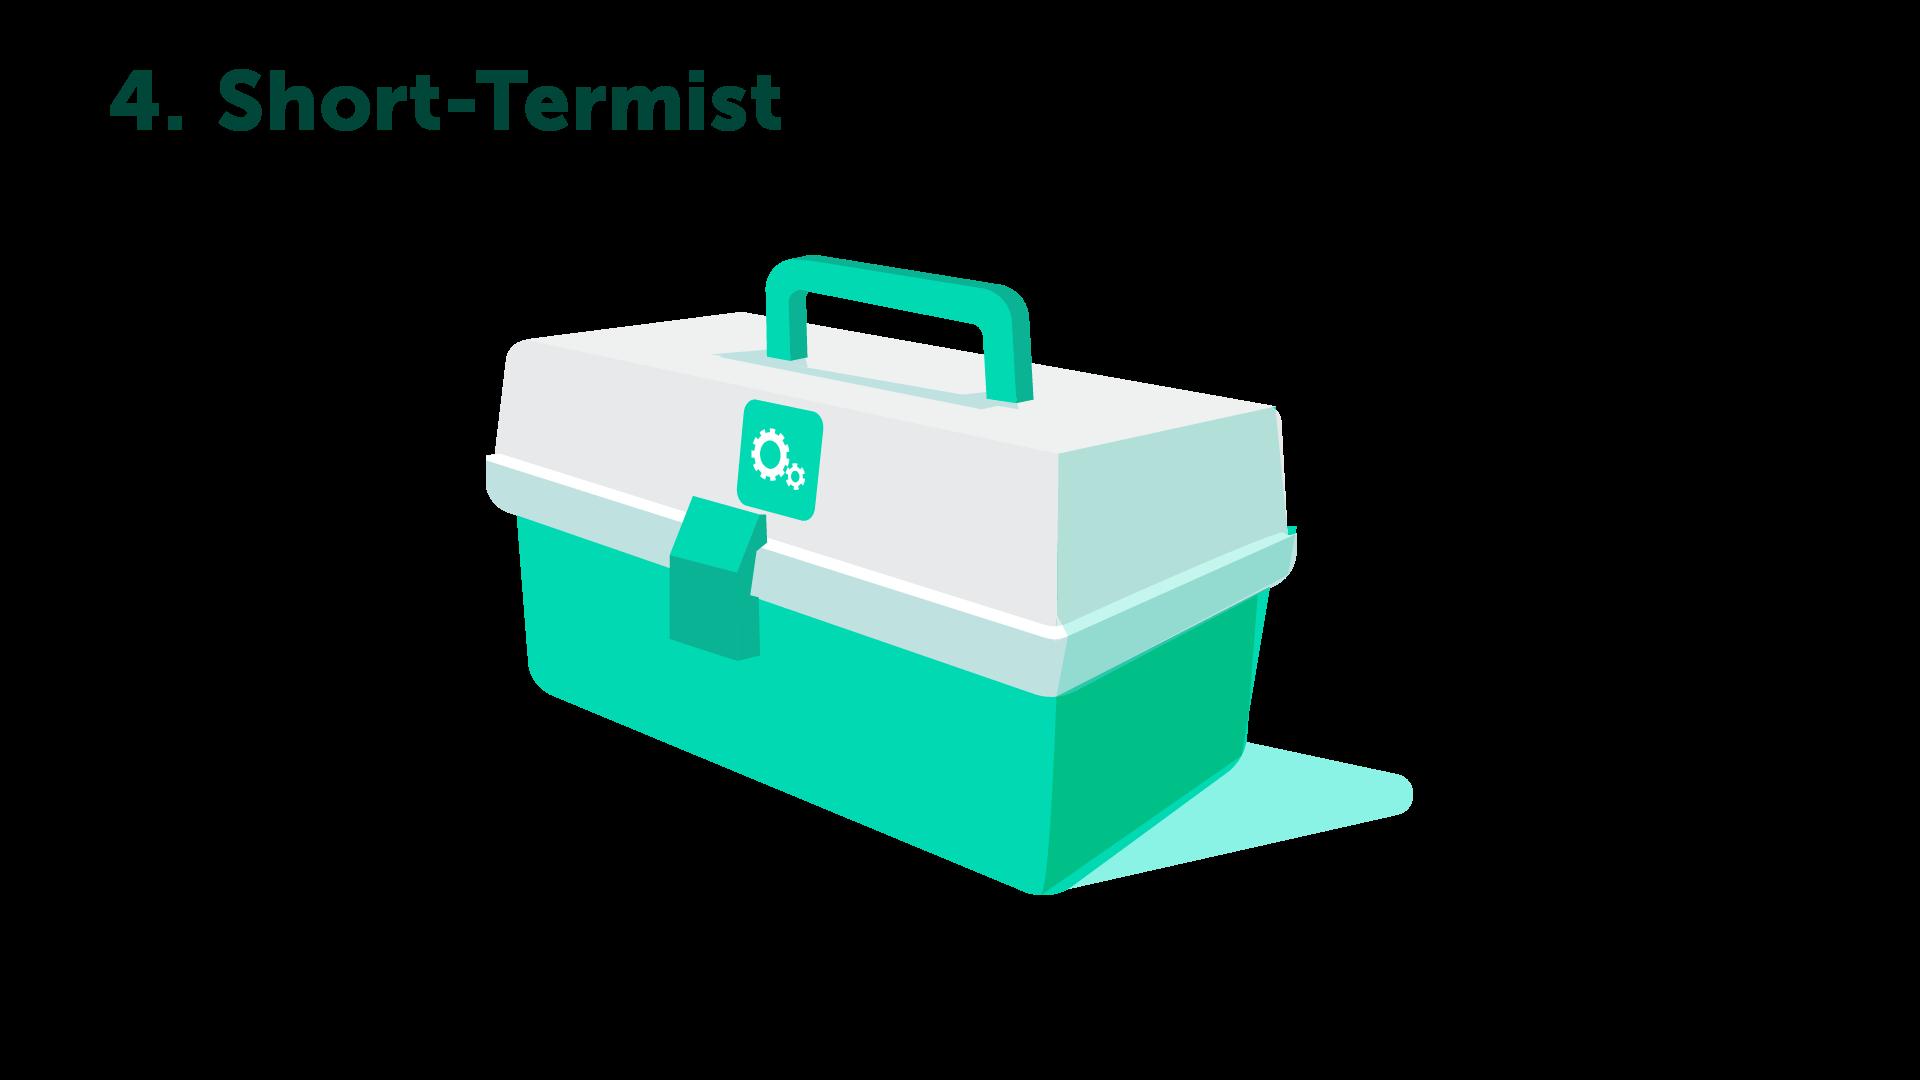 Short termist